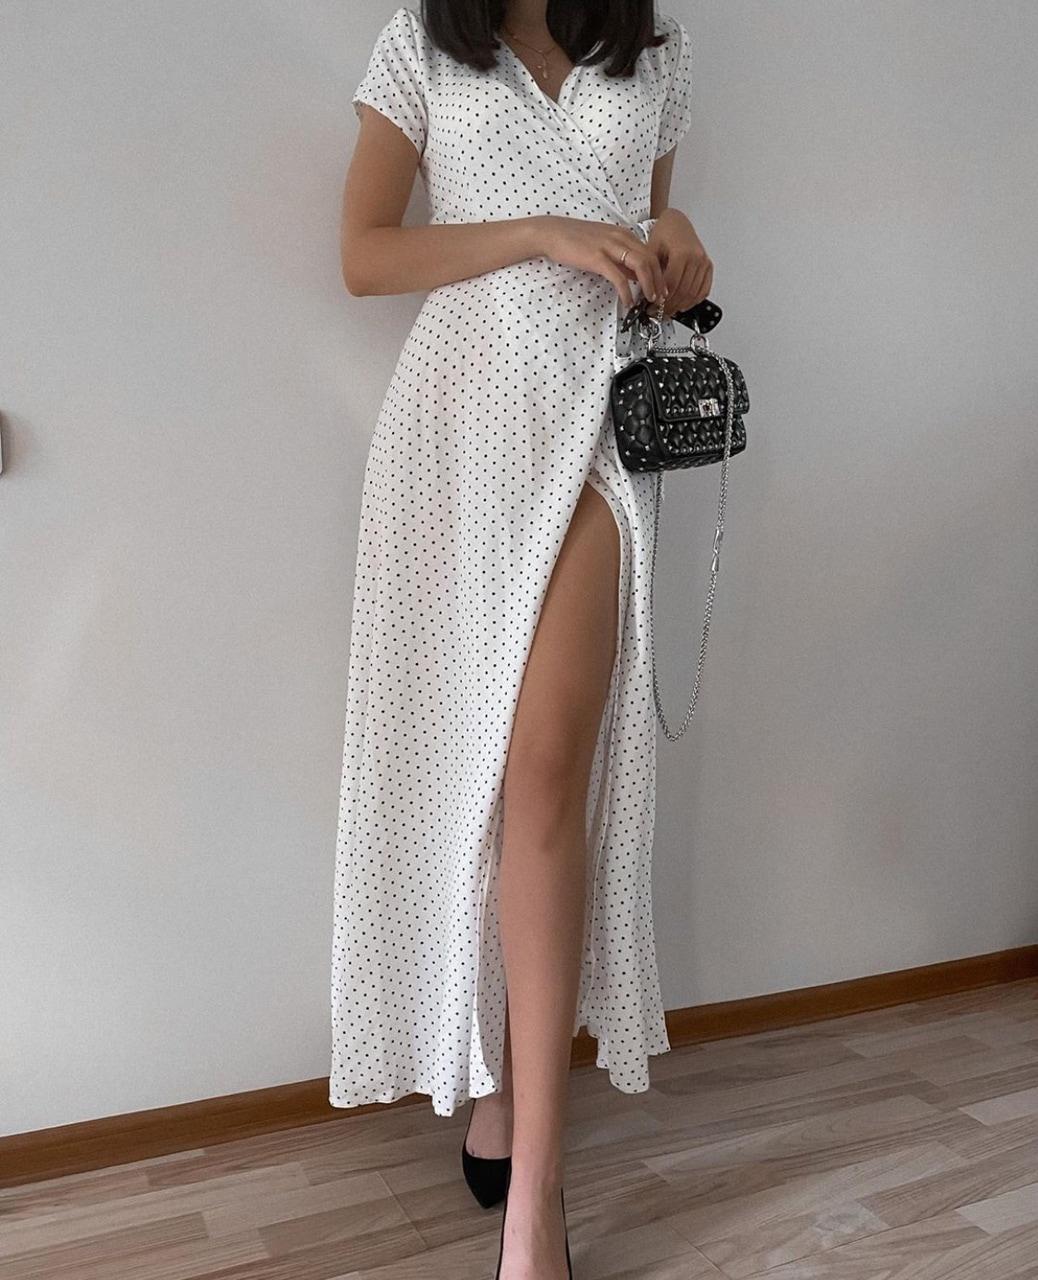 aesthetic, bag, and dress image